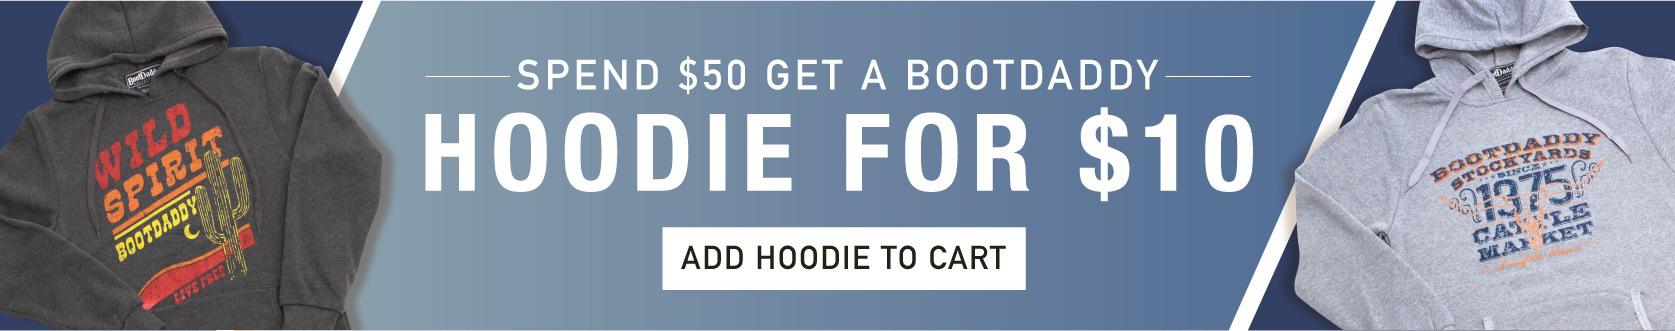 Fall BootDaddy Hoodies